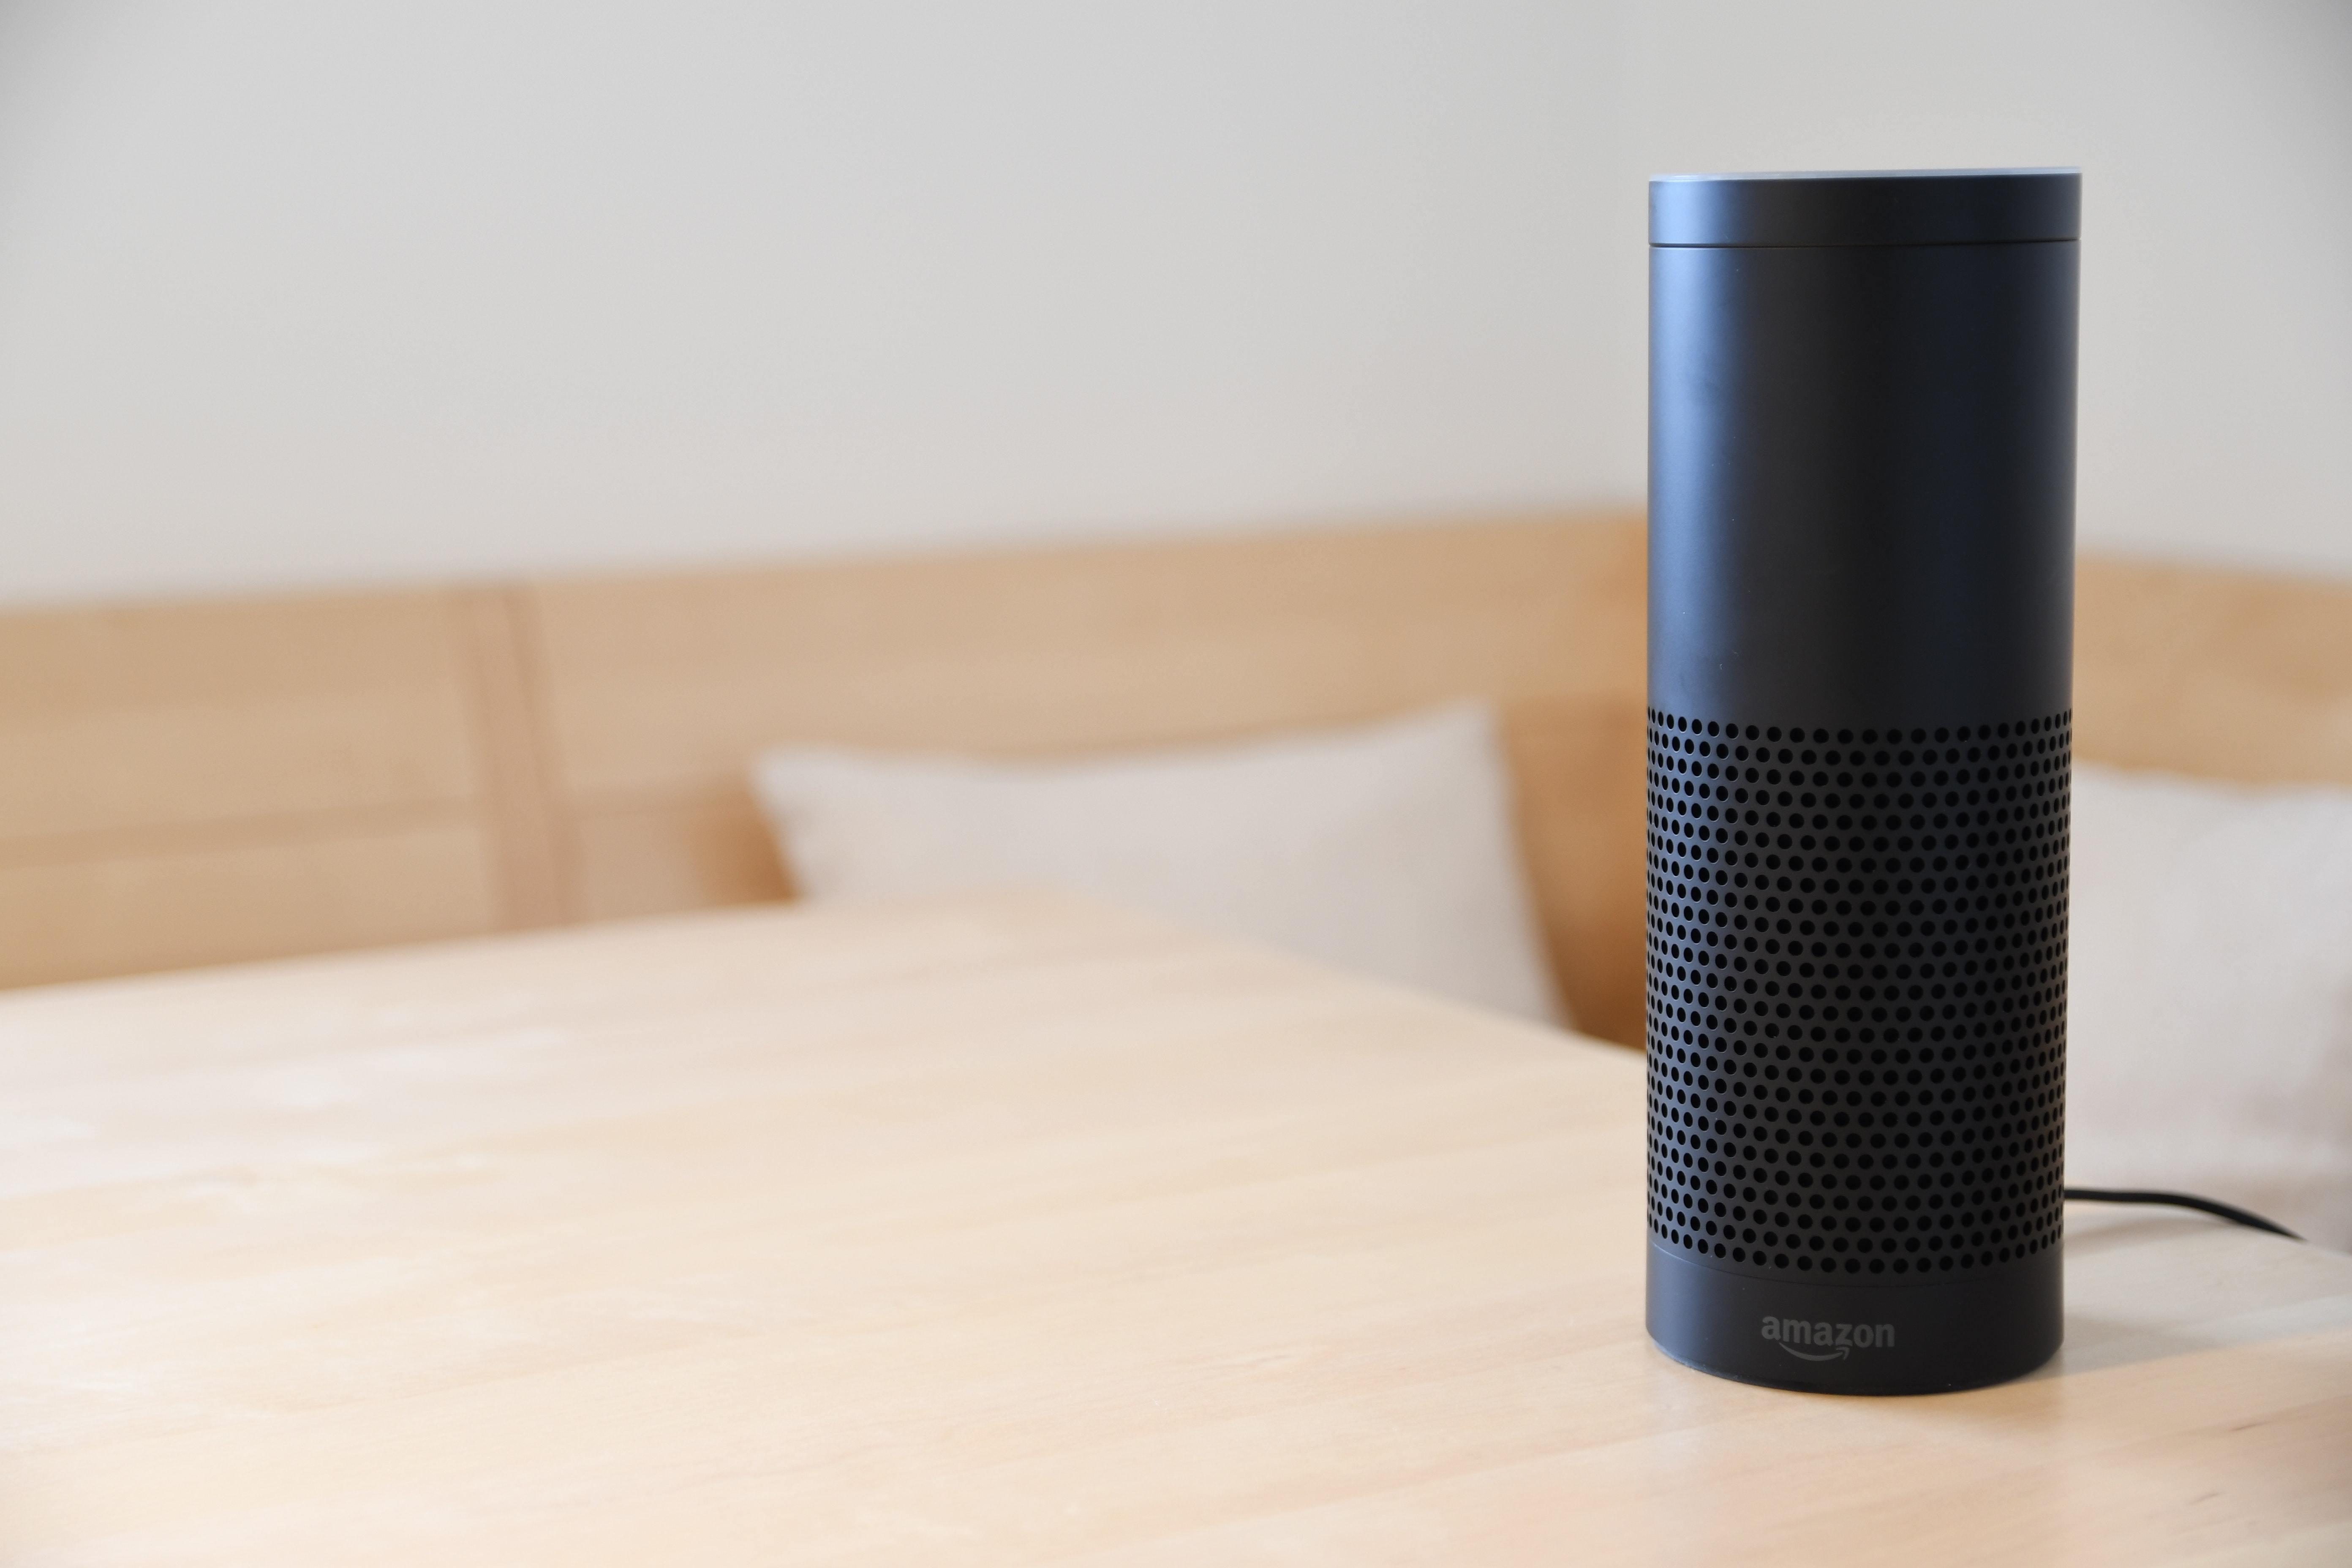 042 Amazon Alexa